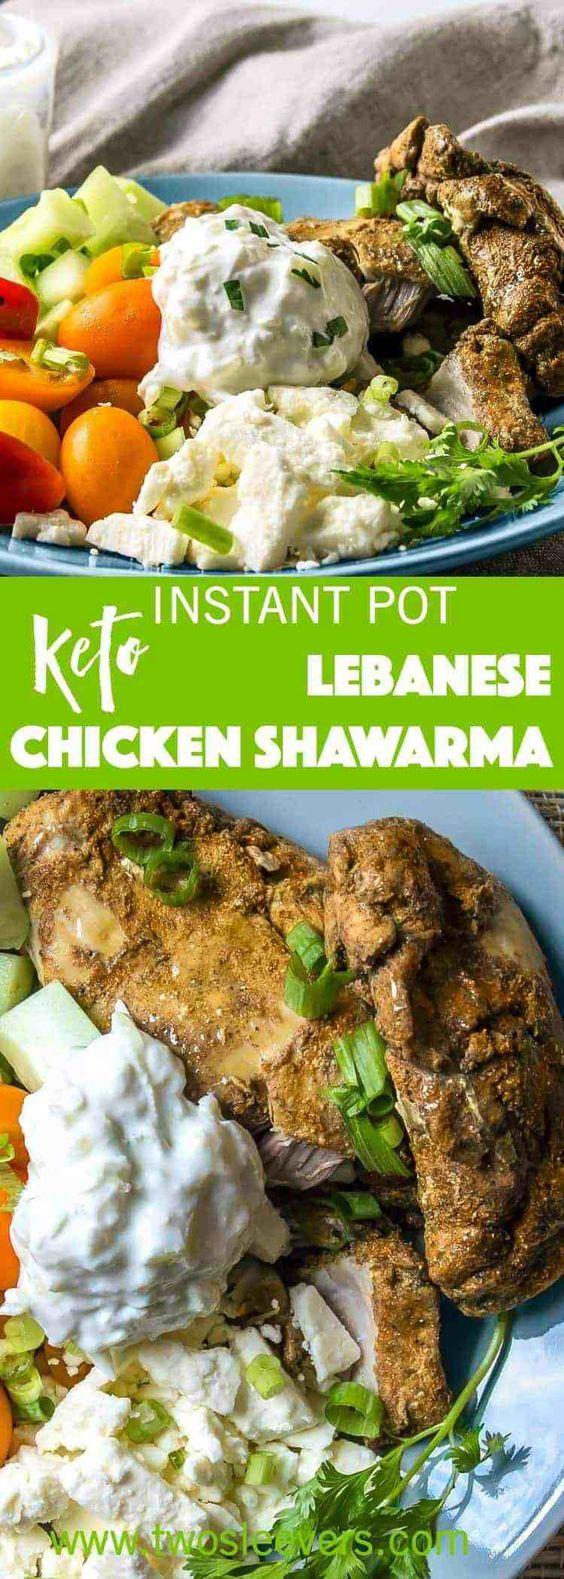 Keto/Low Carb Chicken Shawarma